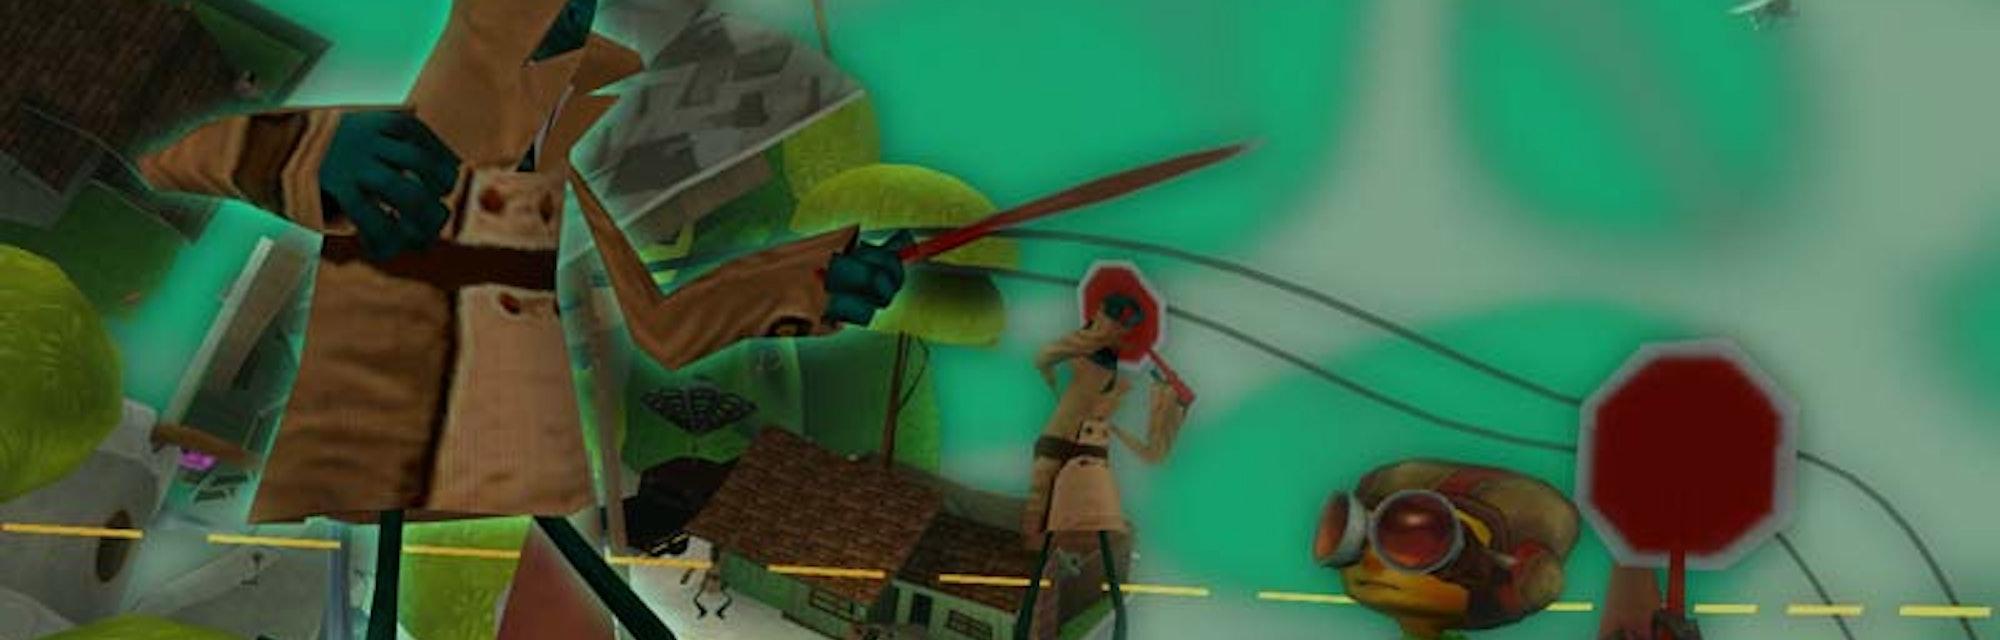 A screenshot from Psychonauts